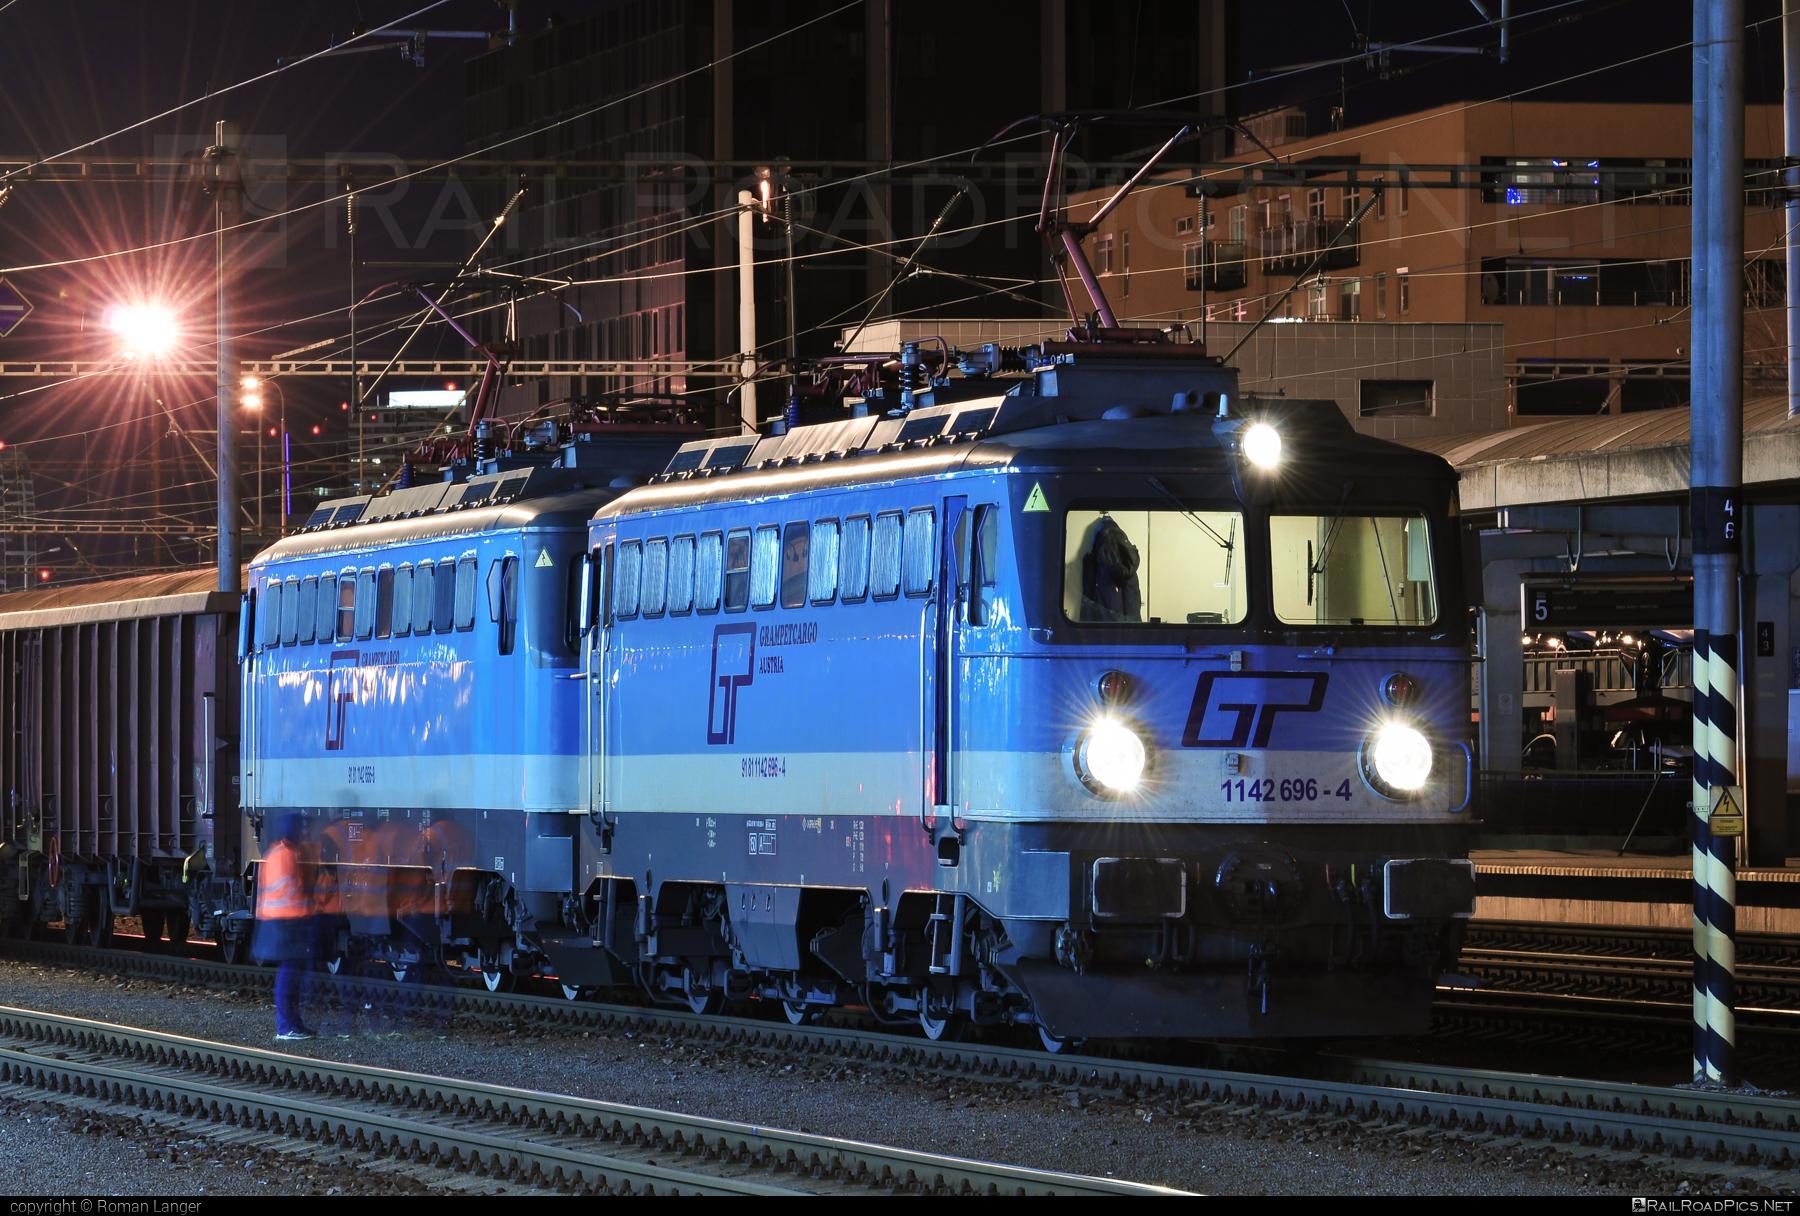 SGP ÖBB Class 1142 - 1142 696-4 operated by Grampetcargo Austria #GrampetcargoAustria #grampetcargo #obbclass1142 #sgp #sgp1142 #simmeringgrazpauker